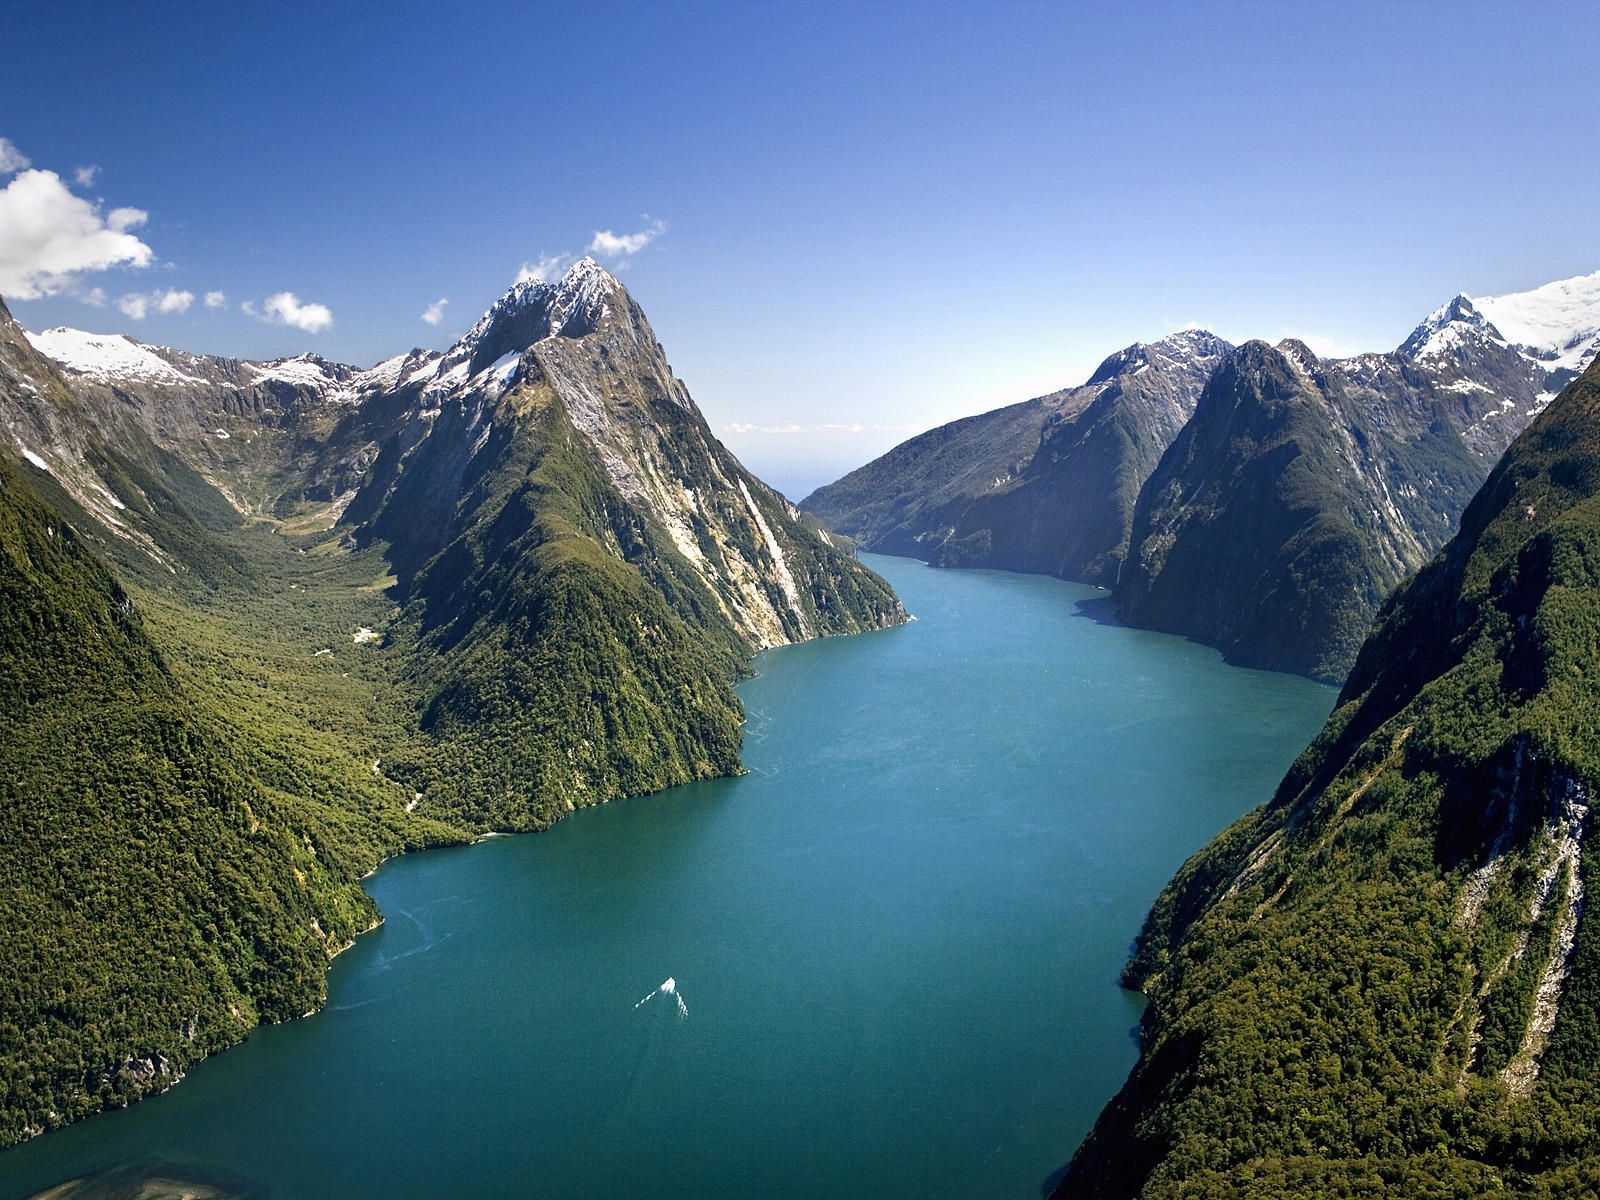 Milford sound peaks and lake